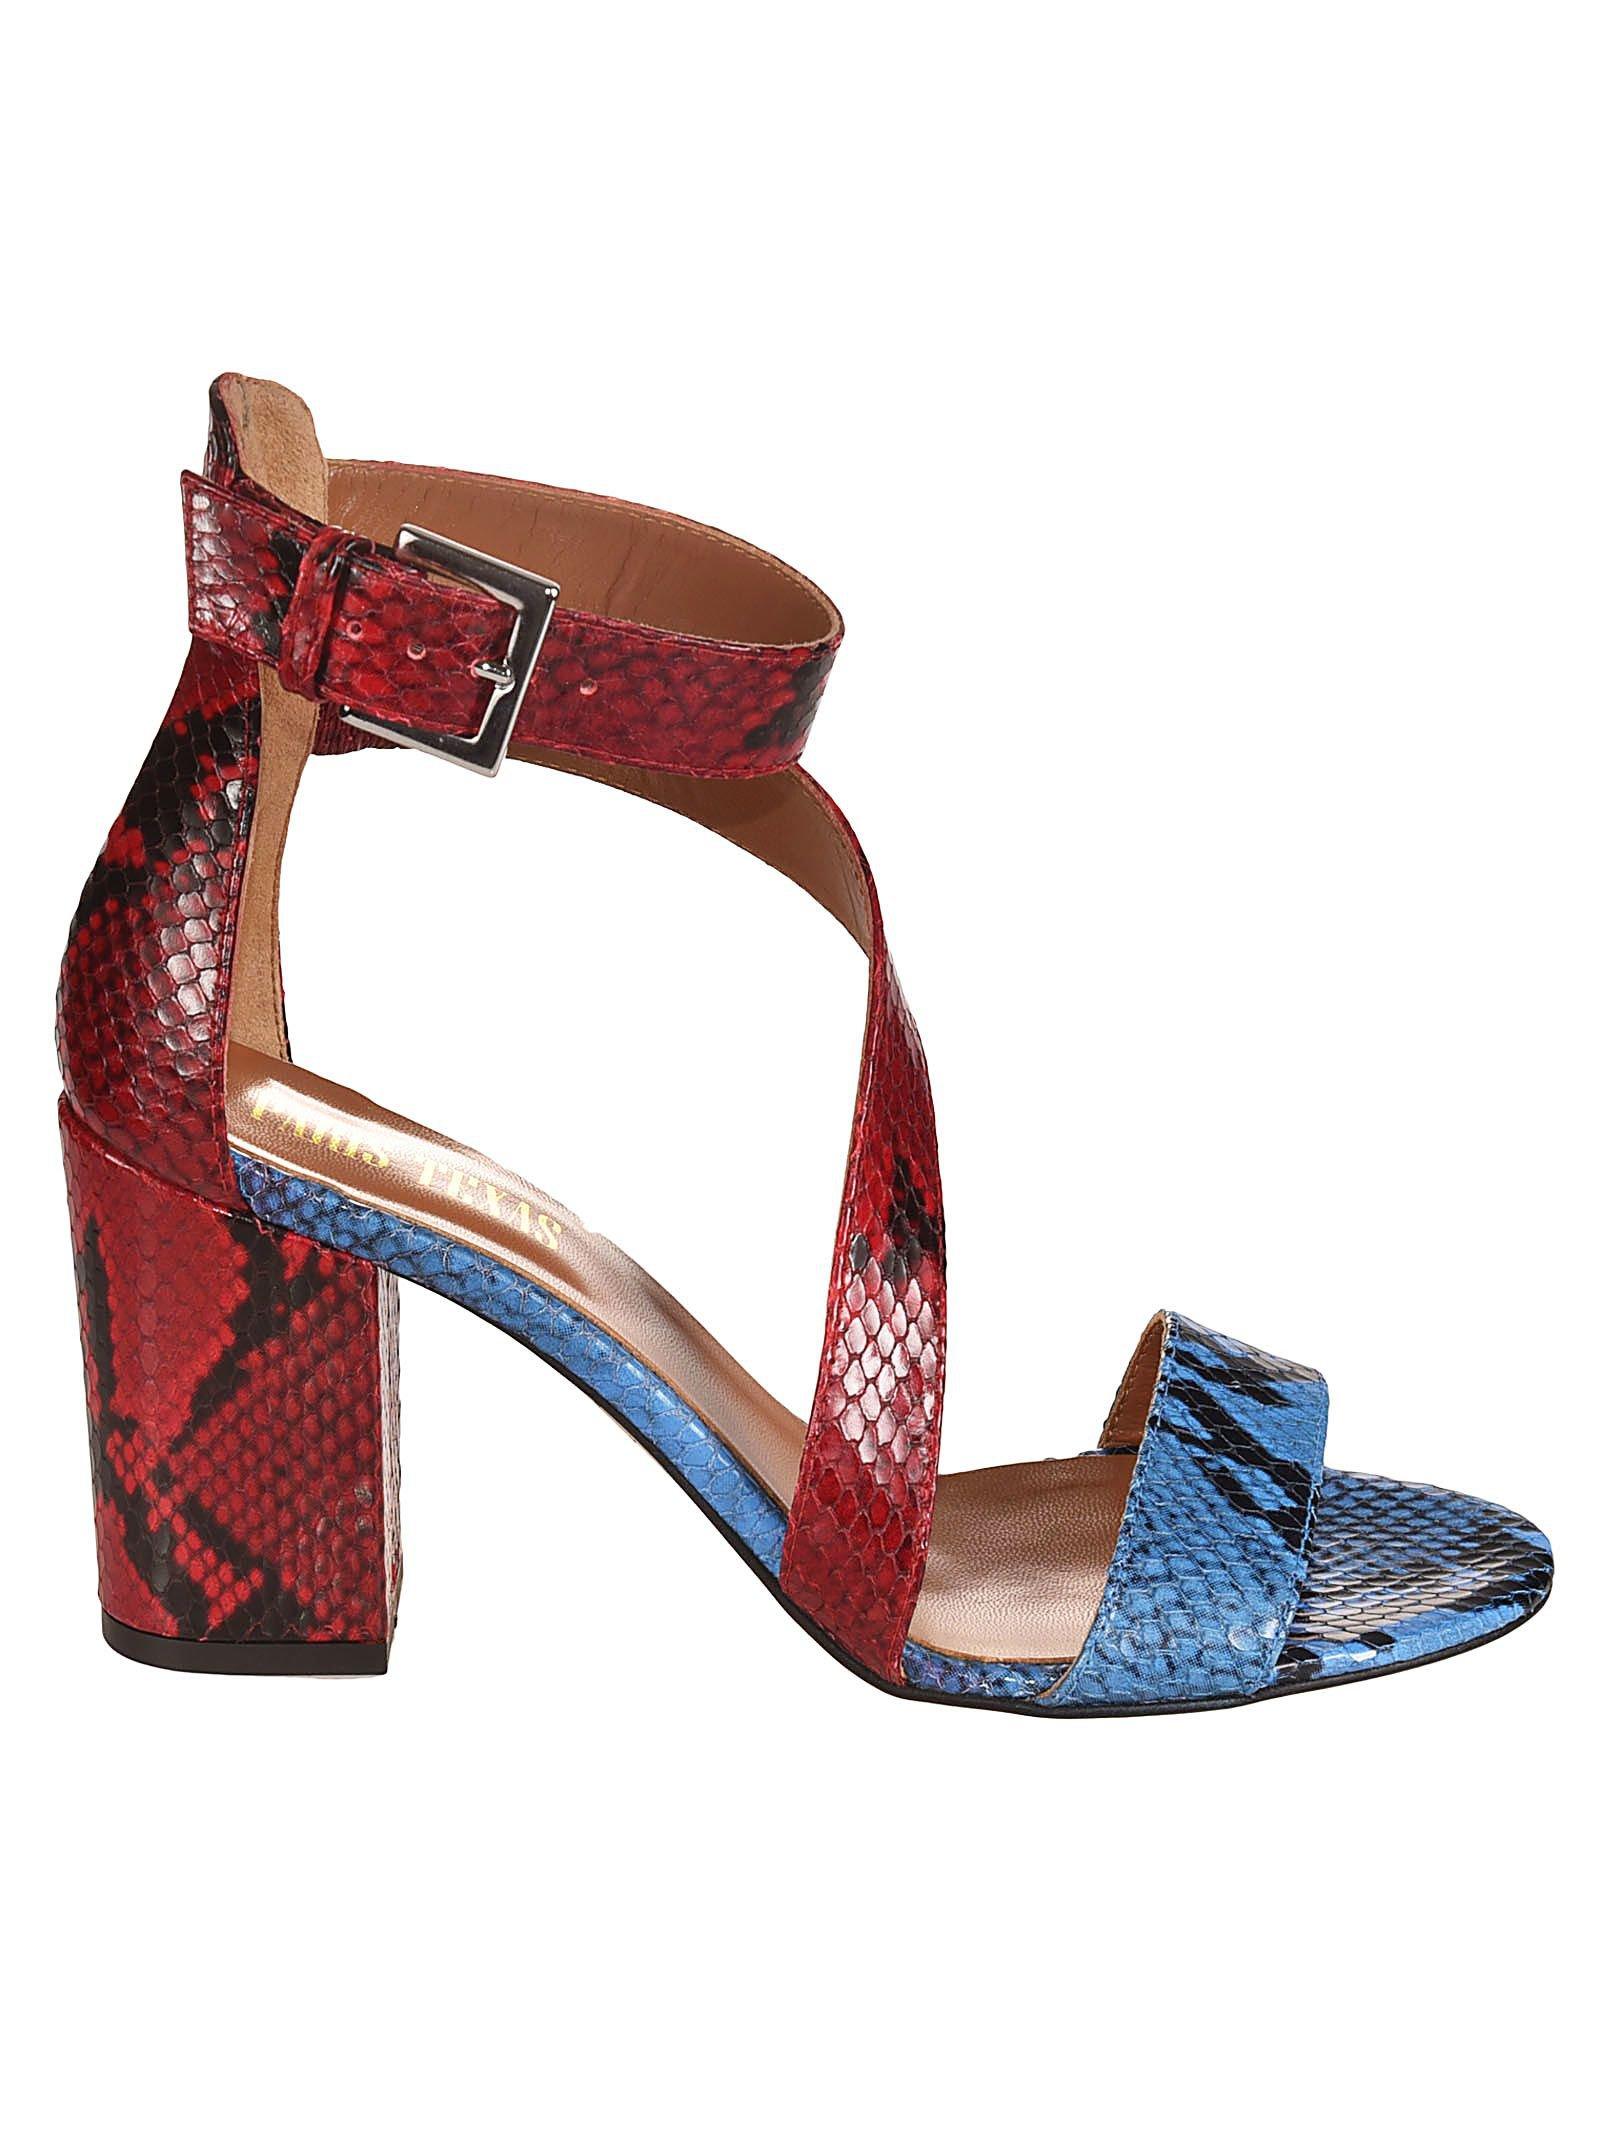 Paris Texas Python Sandals